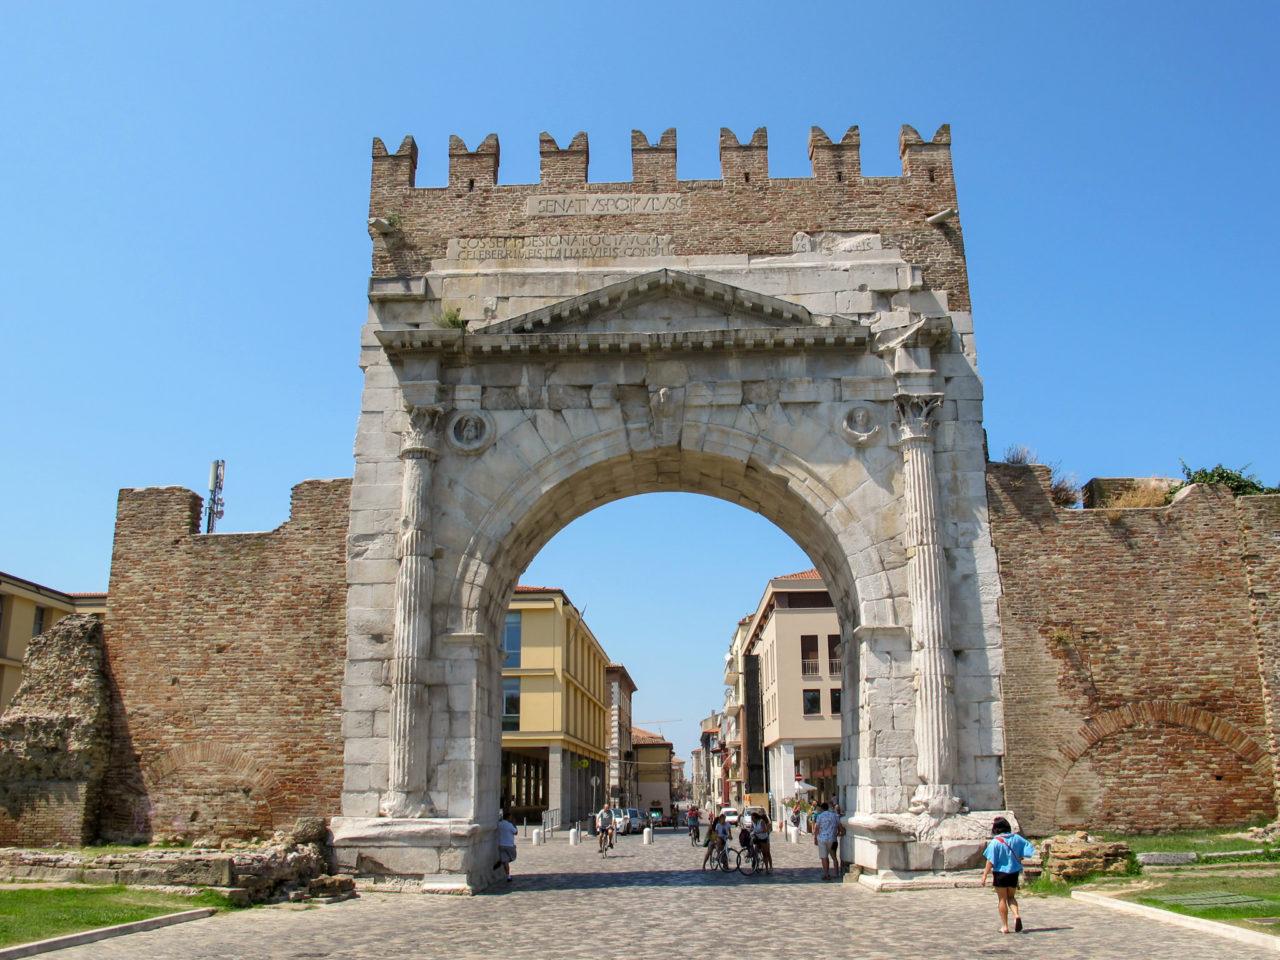 Арка Августа (Arco di Augusto)